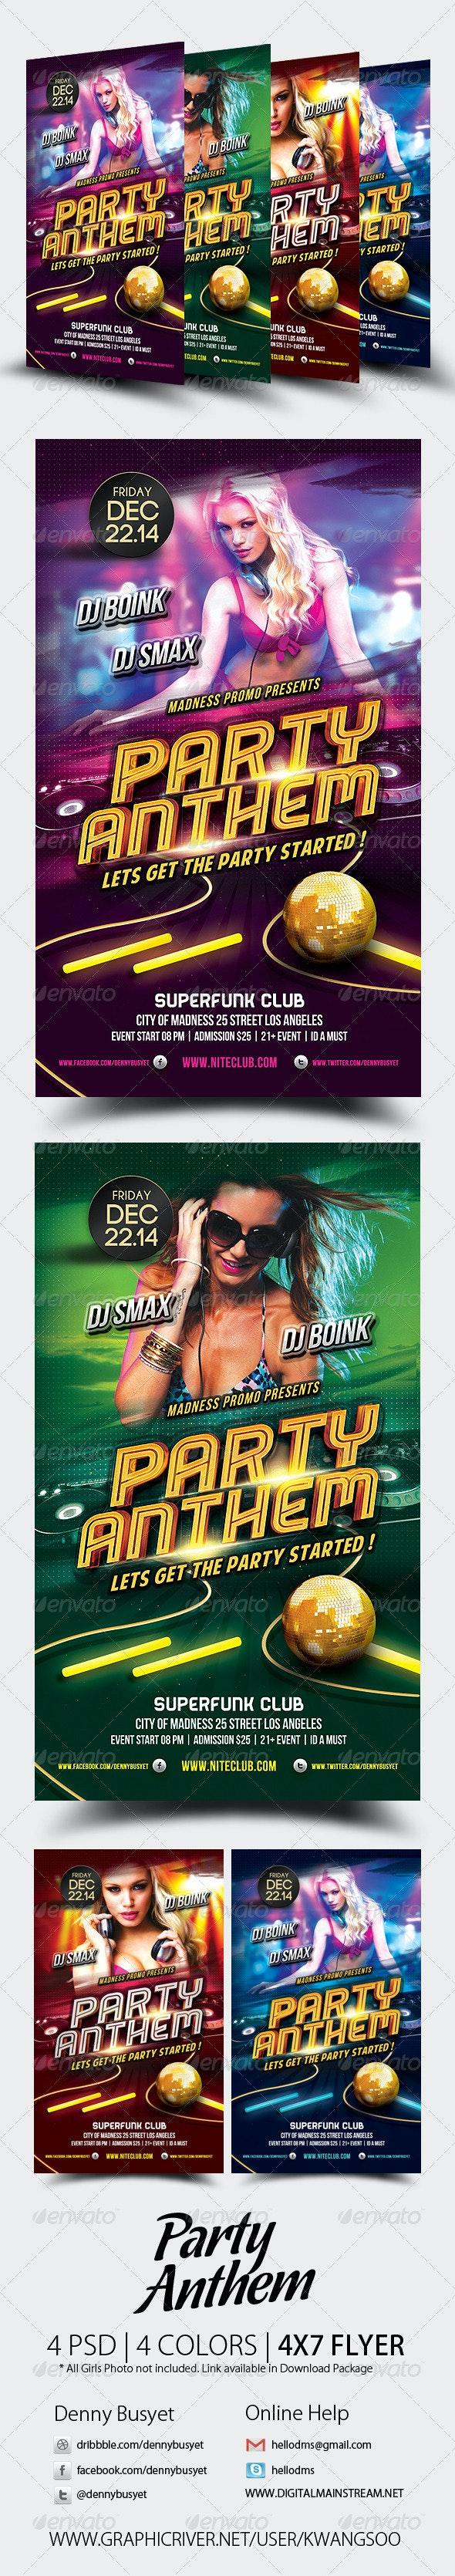 Party Anthem Nightclub Psd Flyer Template - Events Flyers